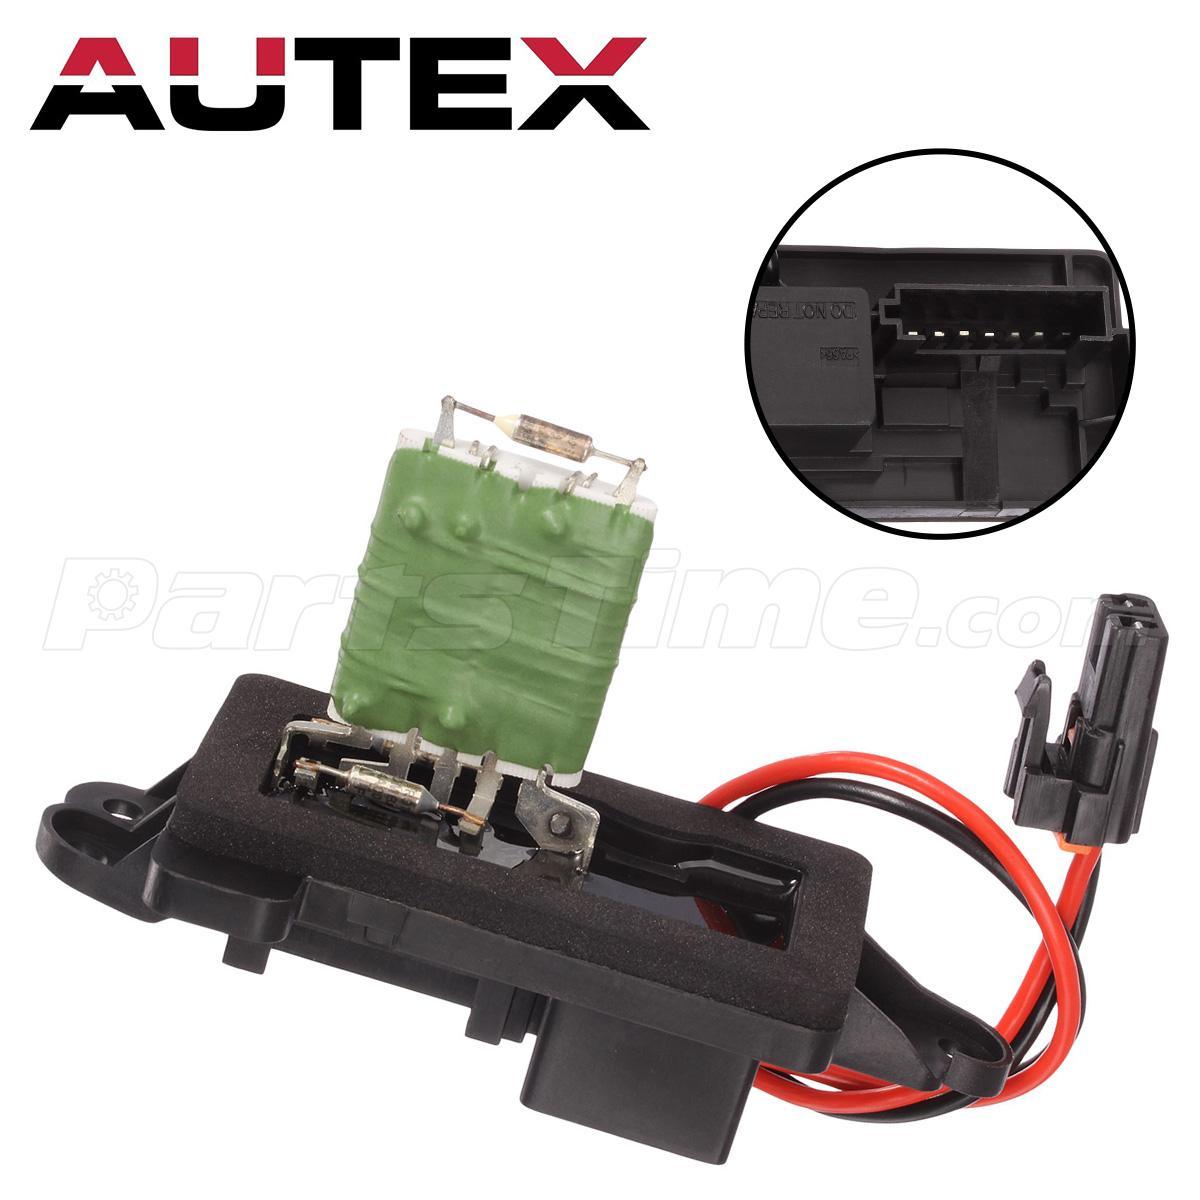 2003 chevy silverado blower motor resistor autozone 28 for Duralast ac heater blower motor resistor